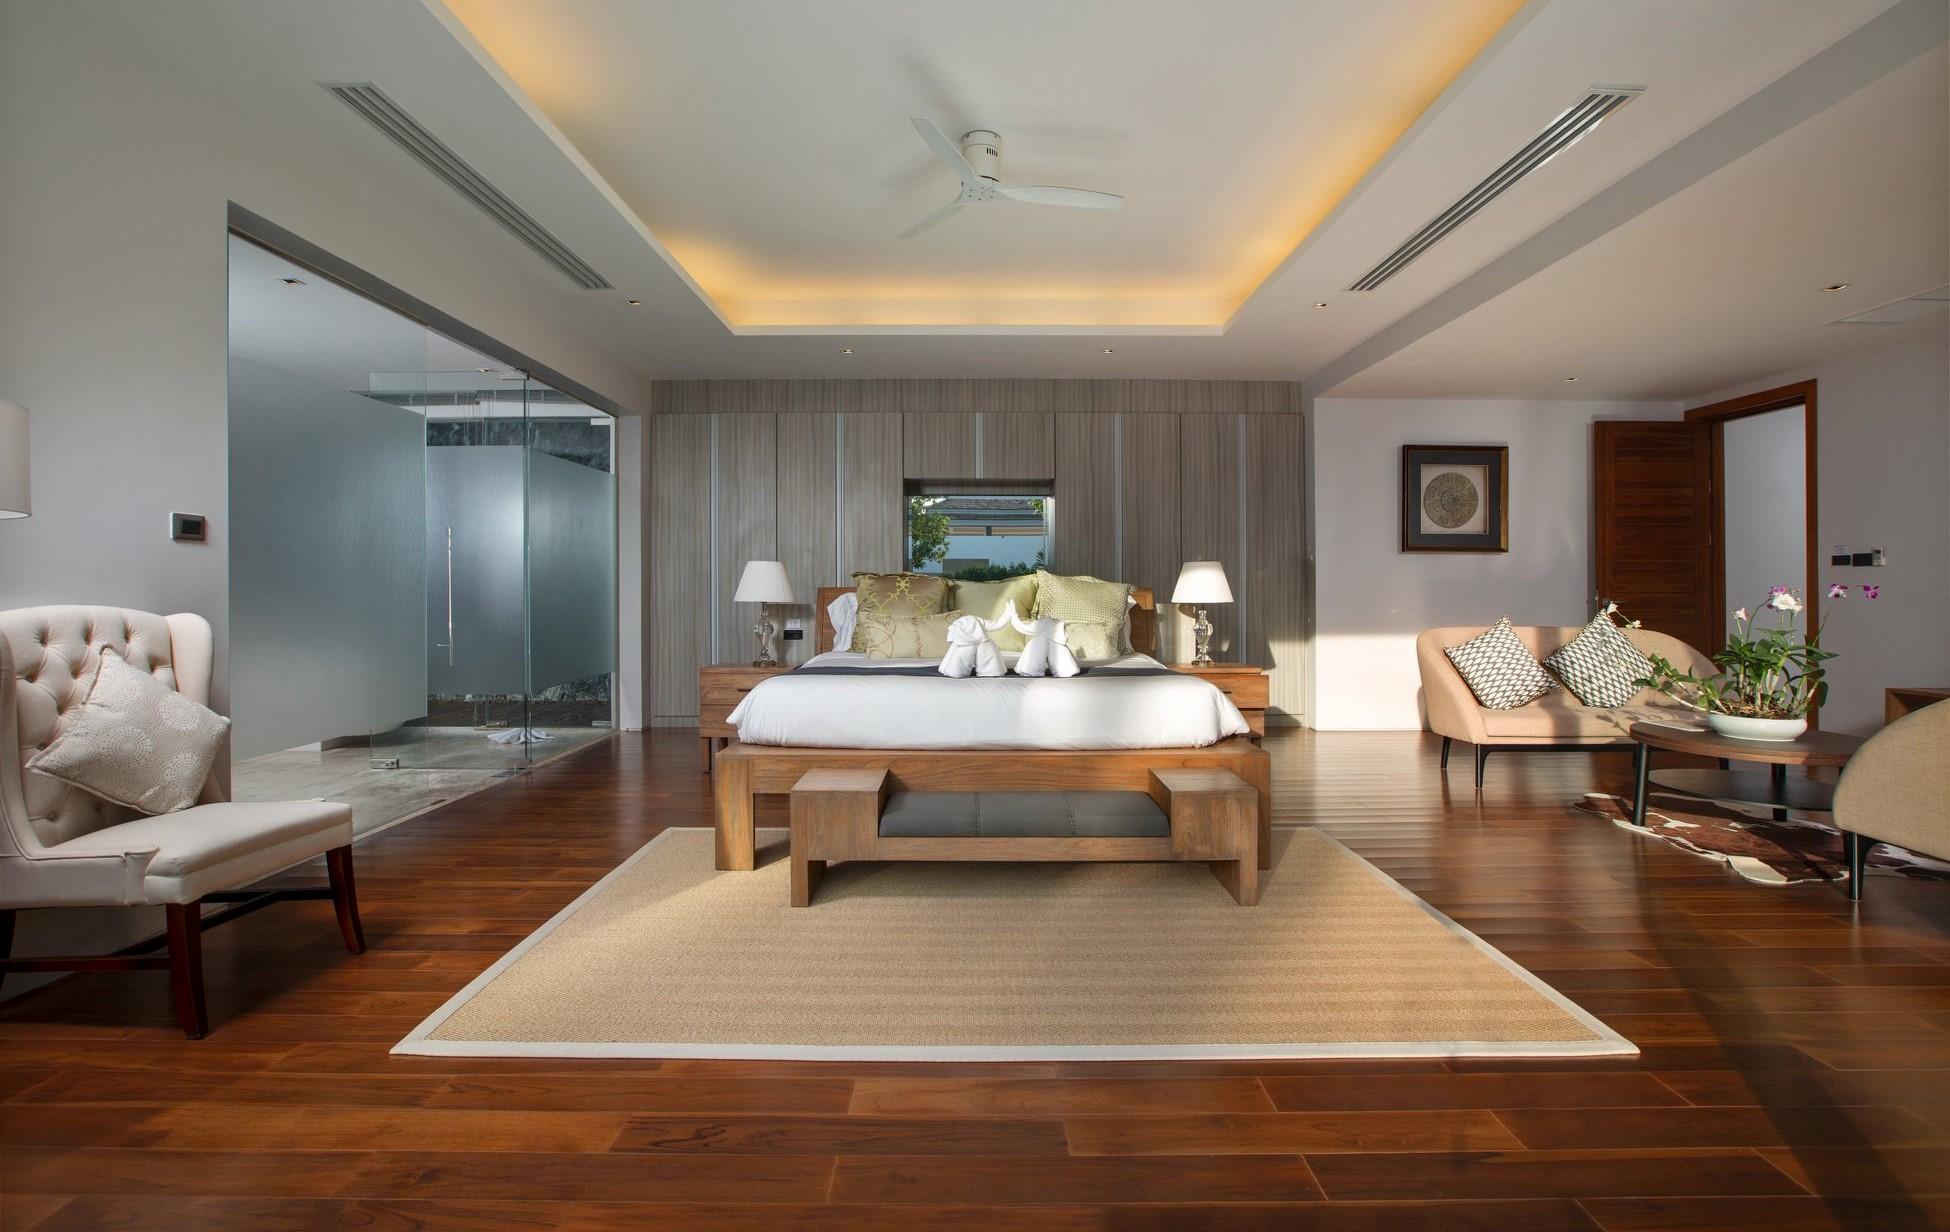 Phuket Real Eastate Agency – Laguna (6)